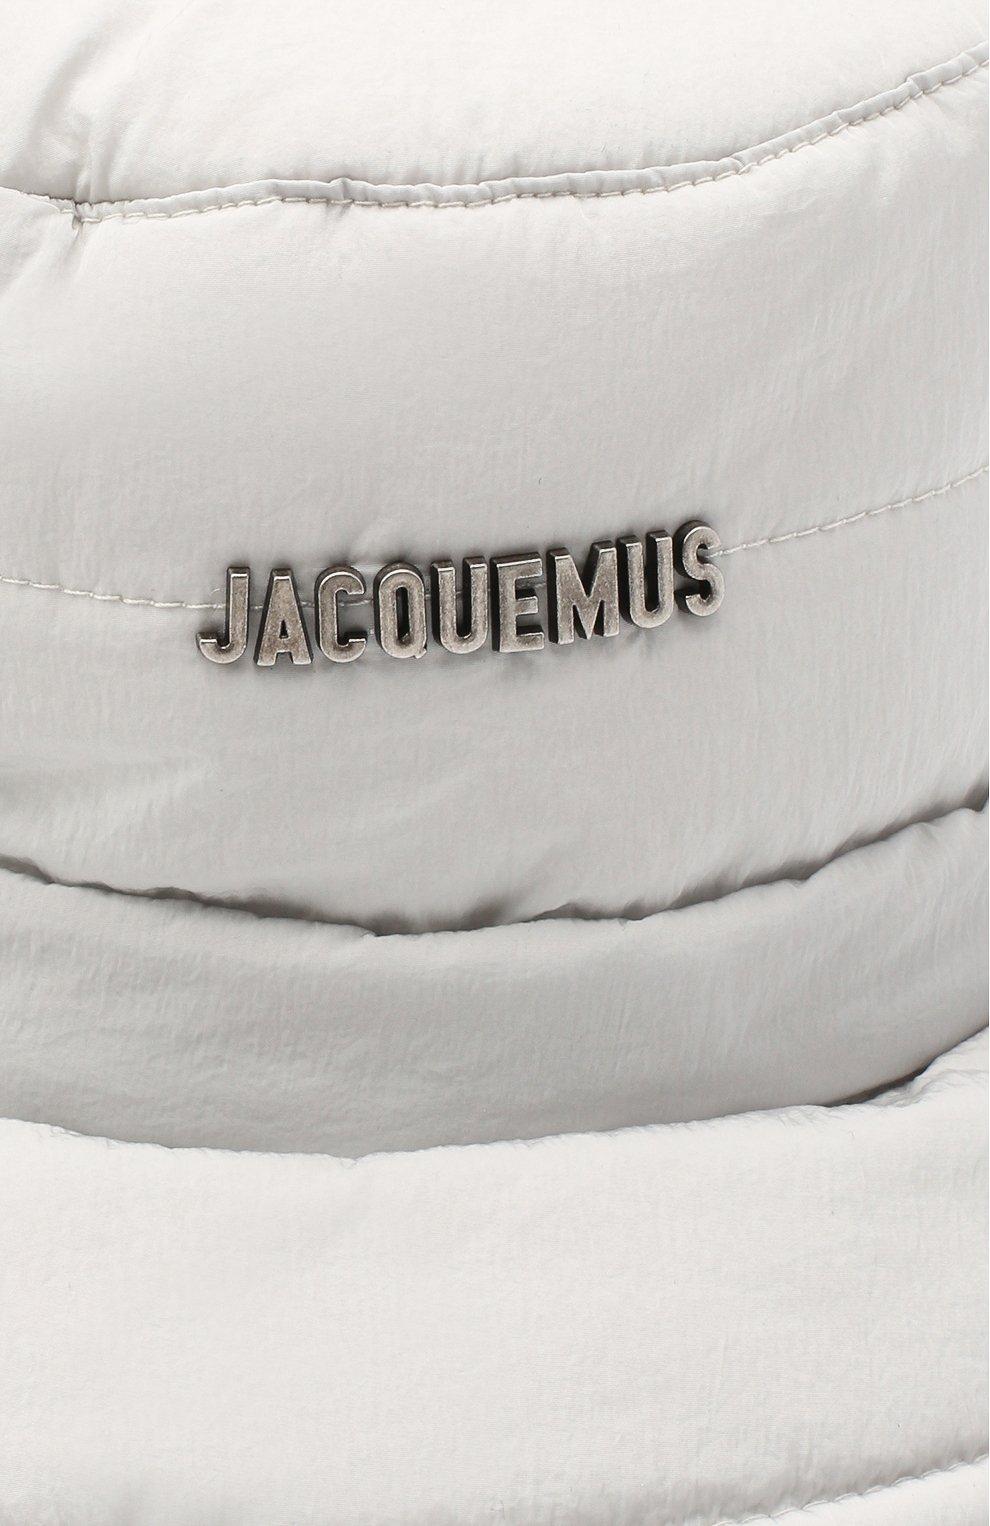 Мужская панама le bob doudoune JACQUEMUS серого цвета, арт. 206AC02/135920 | Фото 3